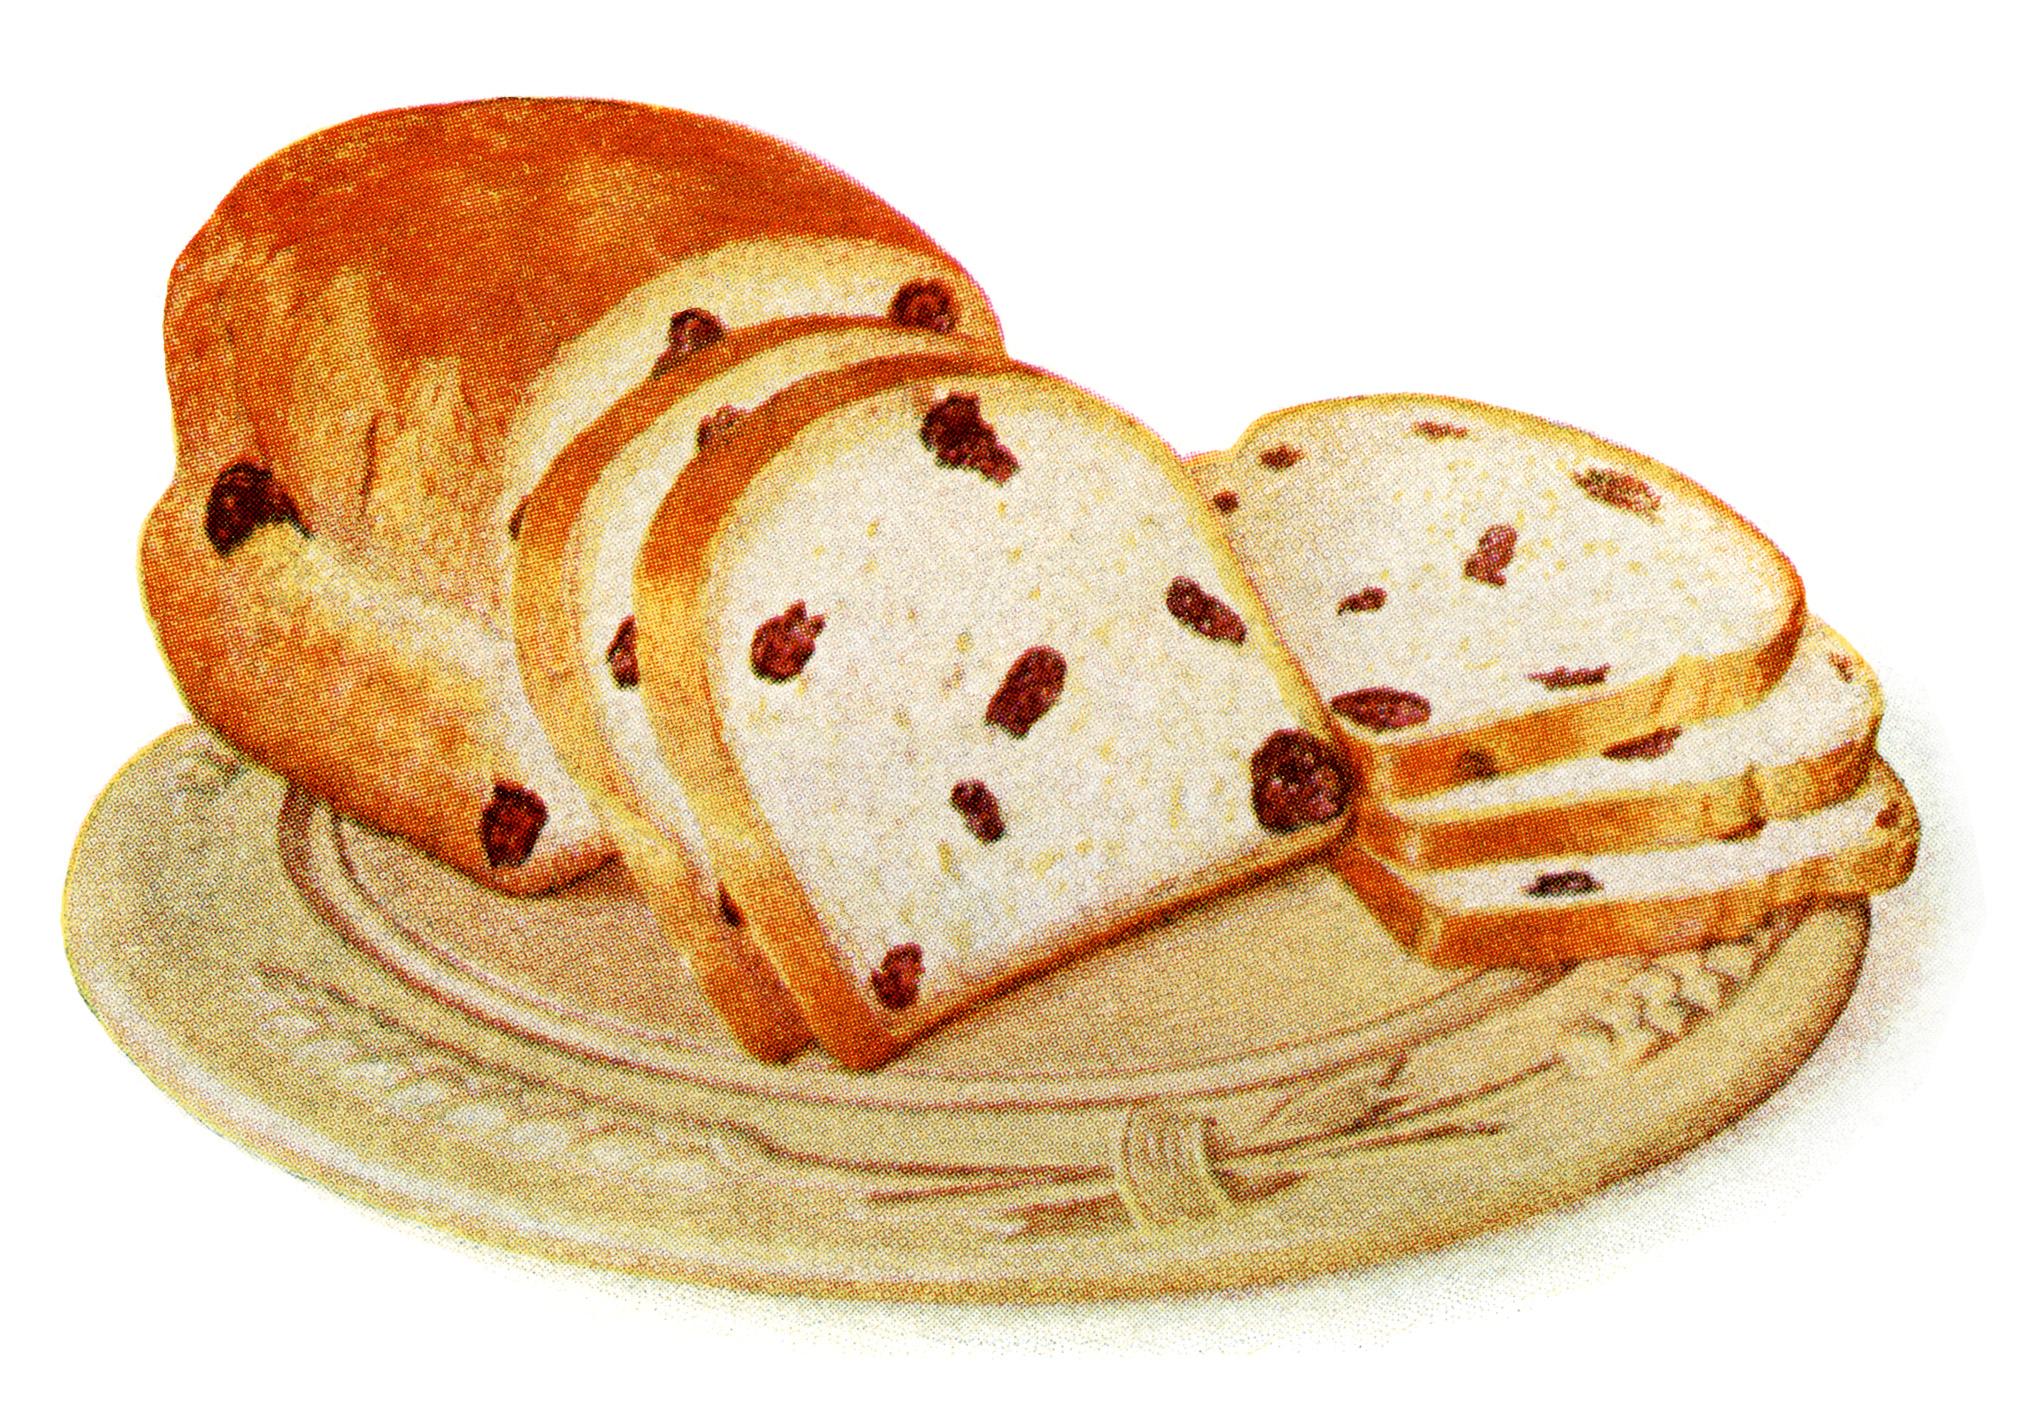 Bread clipart baked goods. Homemade loaf of raisin